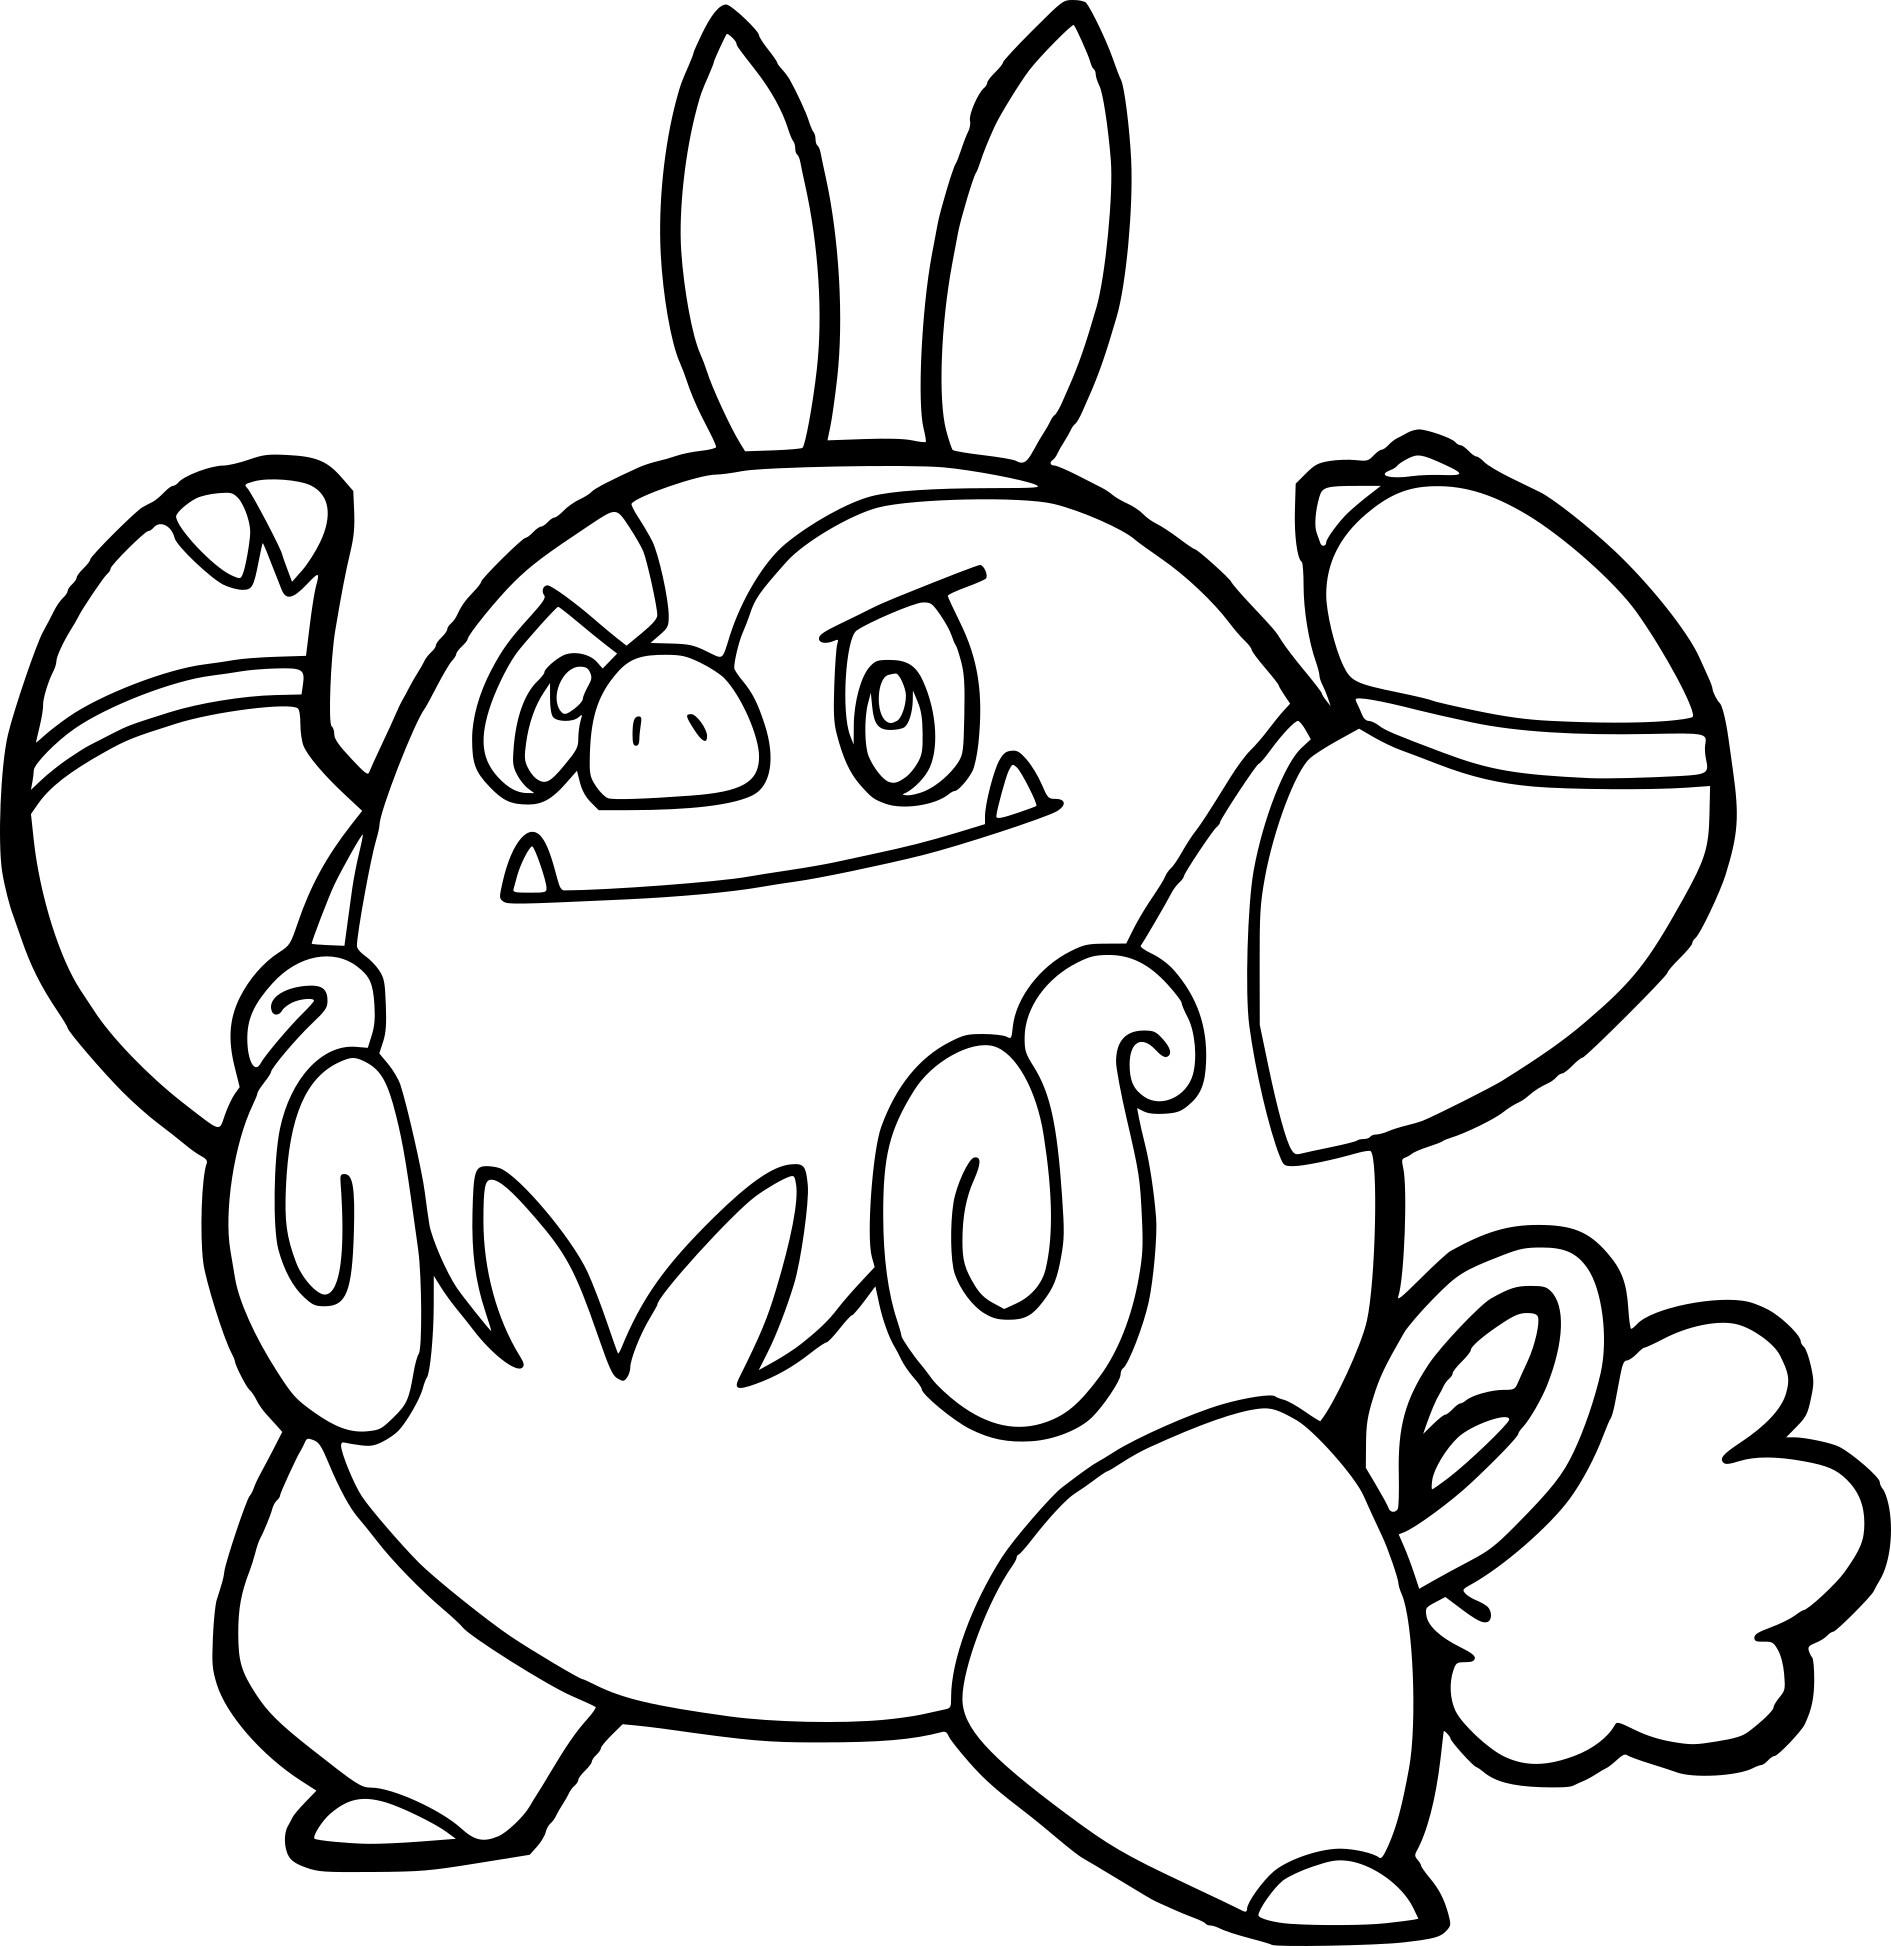 Coloriage grotichon pokemon imprimer - Coloriage pokemon imprimer ...